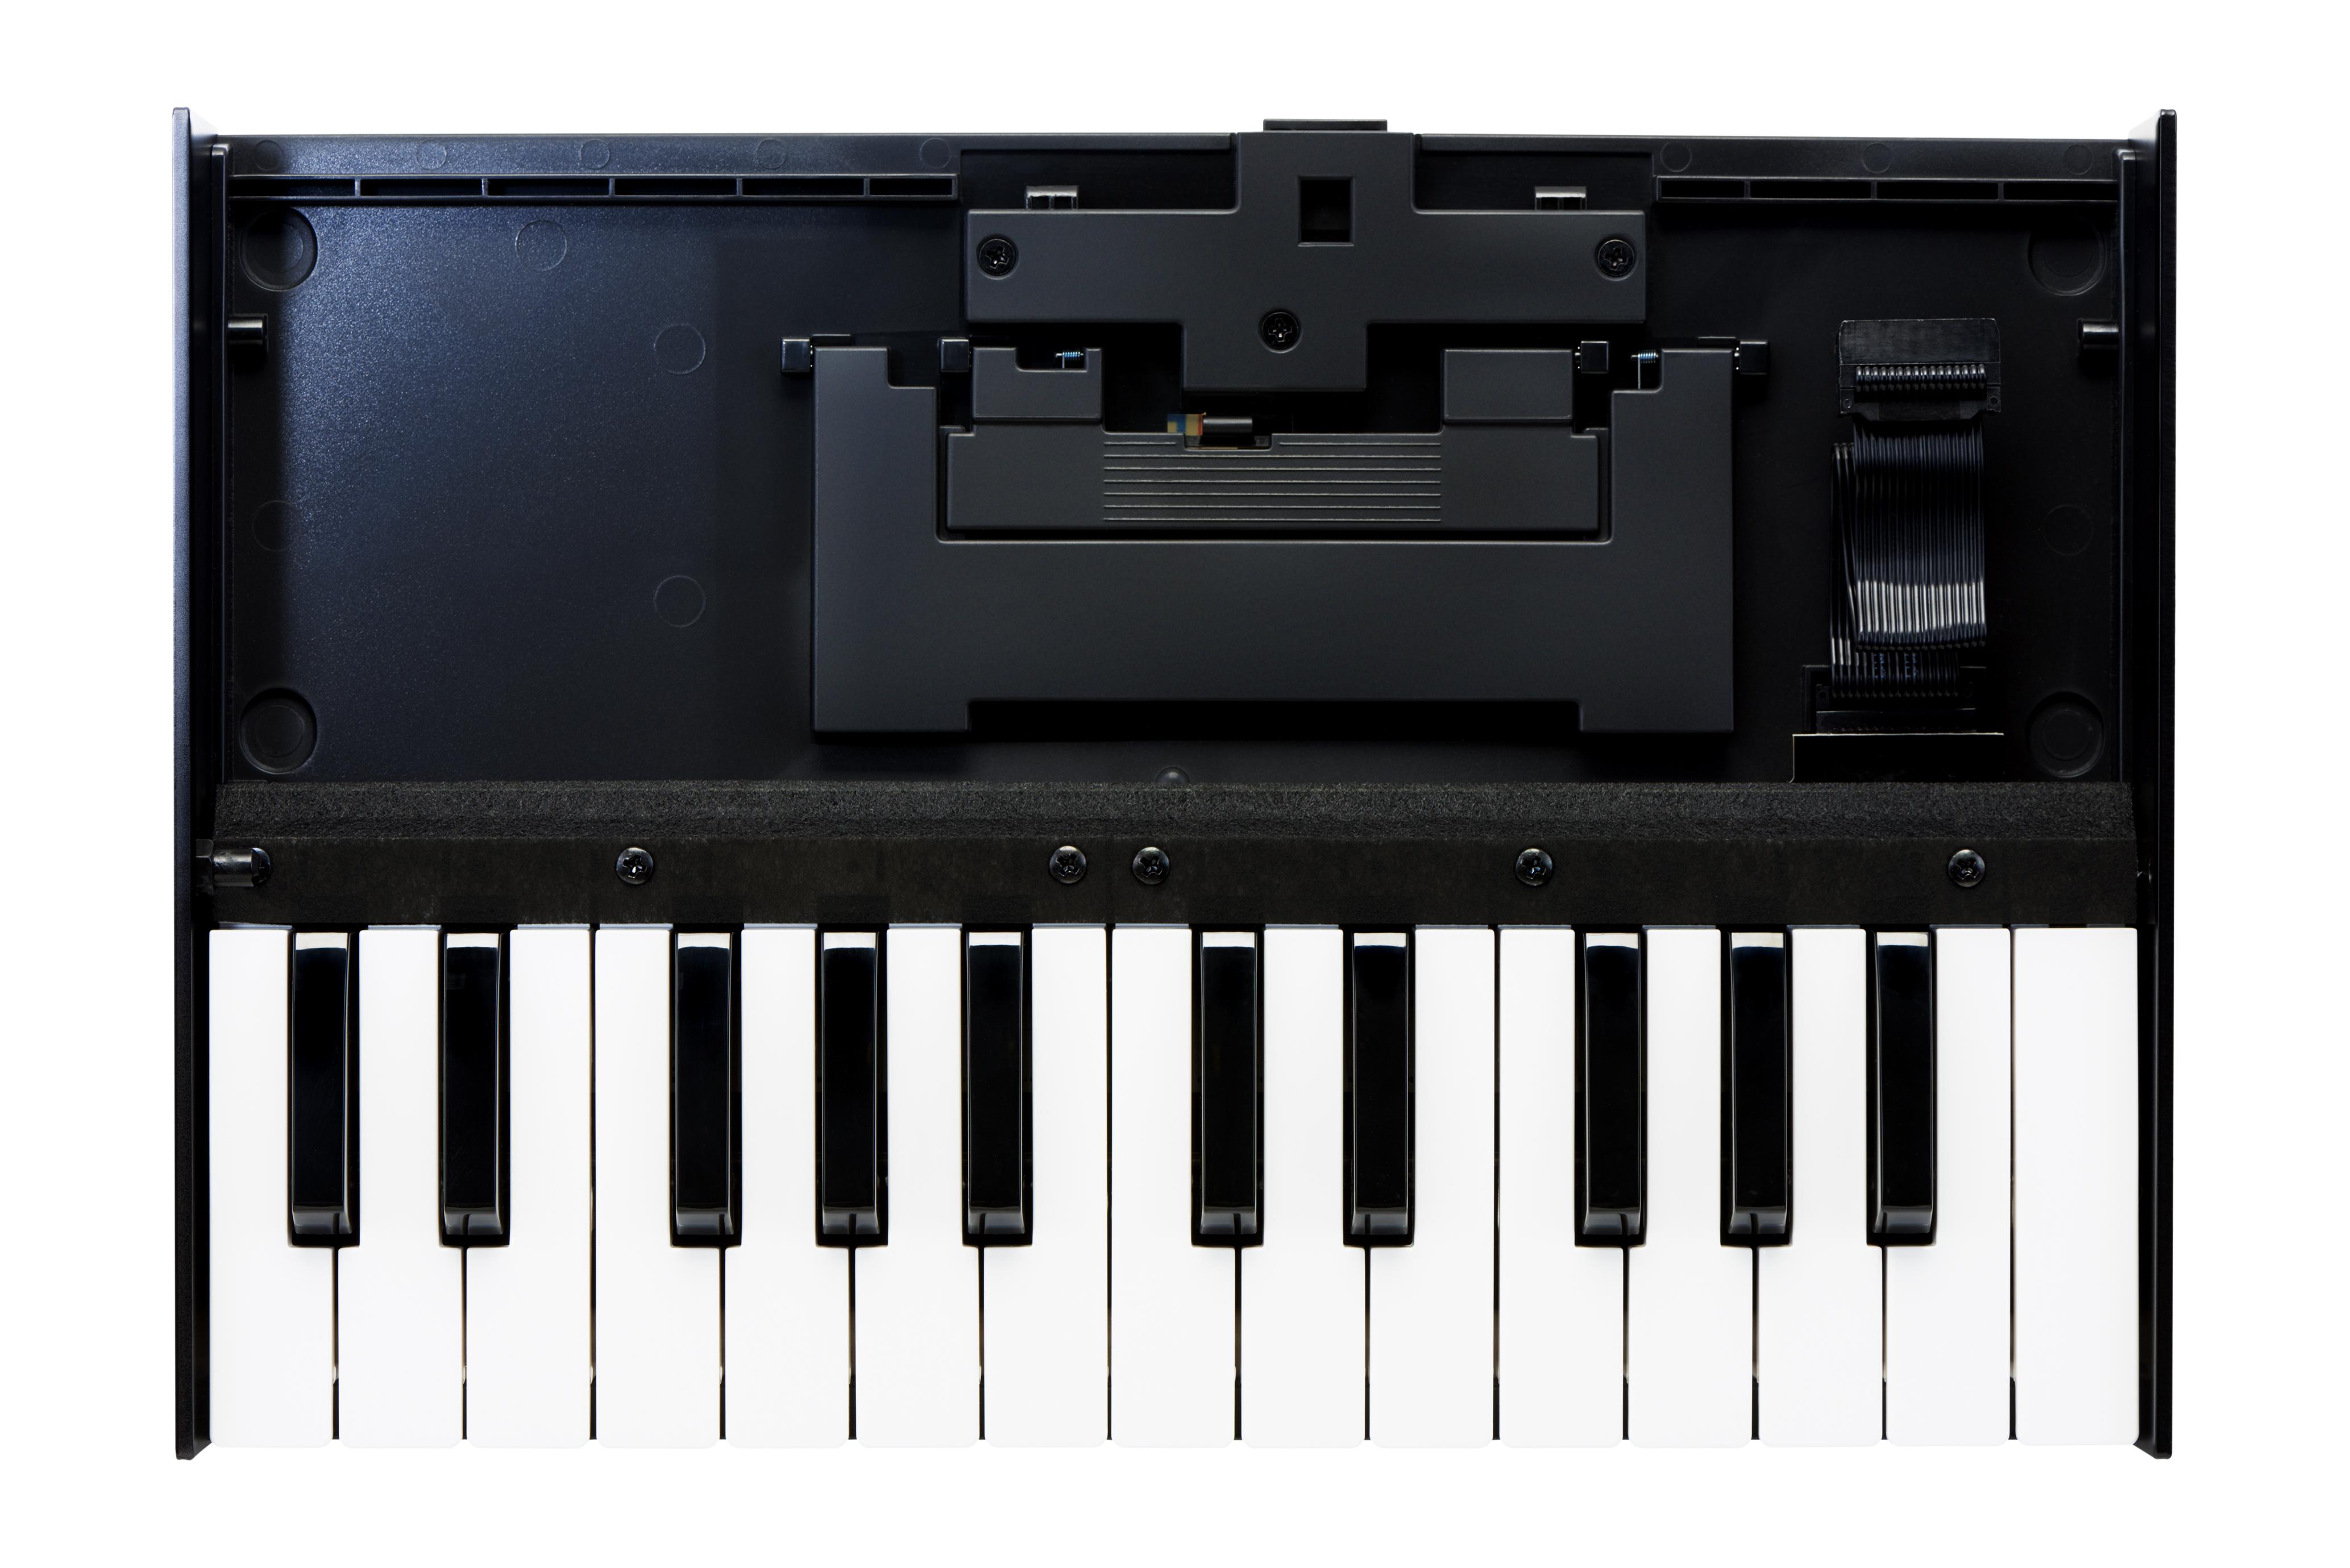 Claviers & Pianos - CLAVIERS - CLAVIERS MAITRES - ROLAND - K-25M - Royez Musik